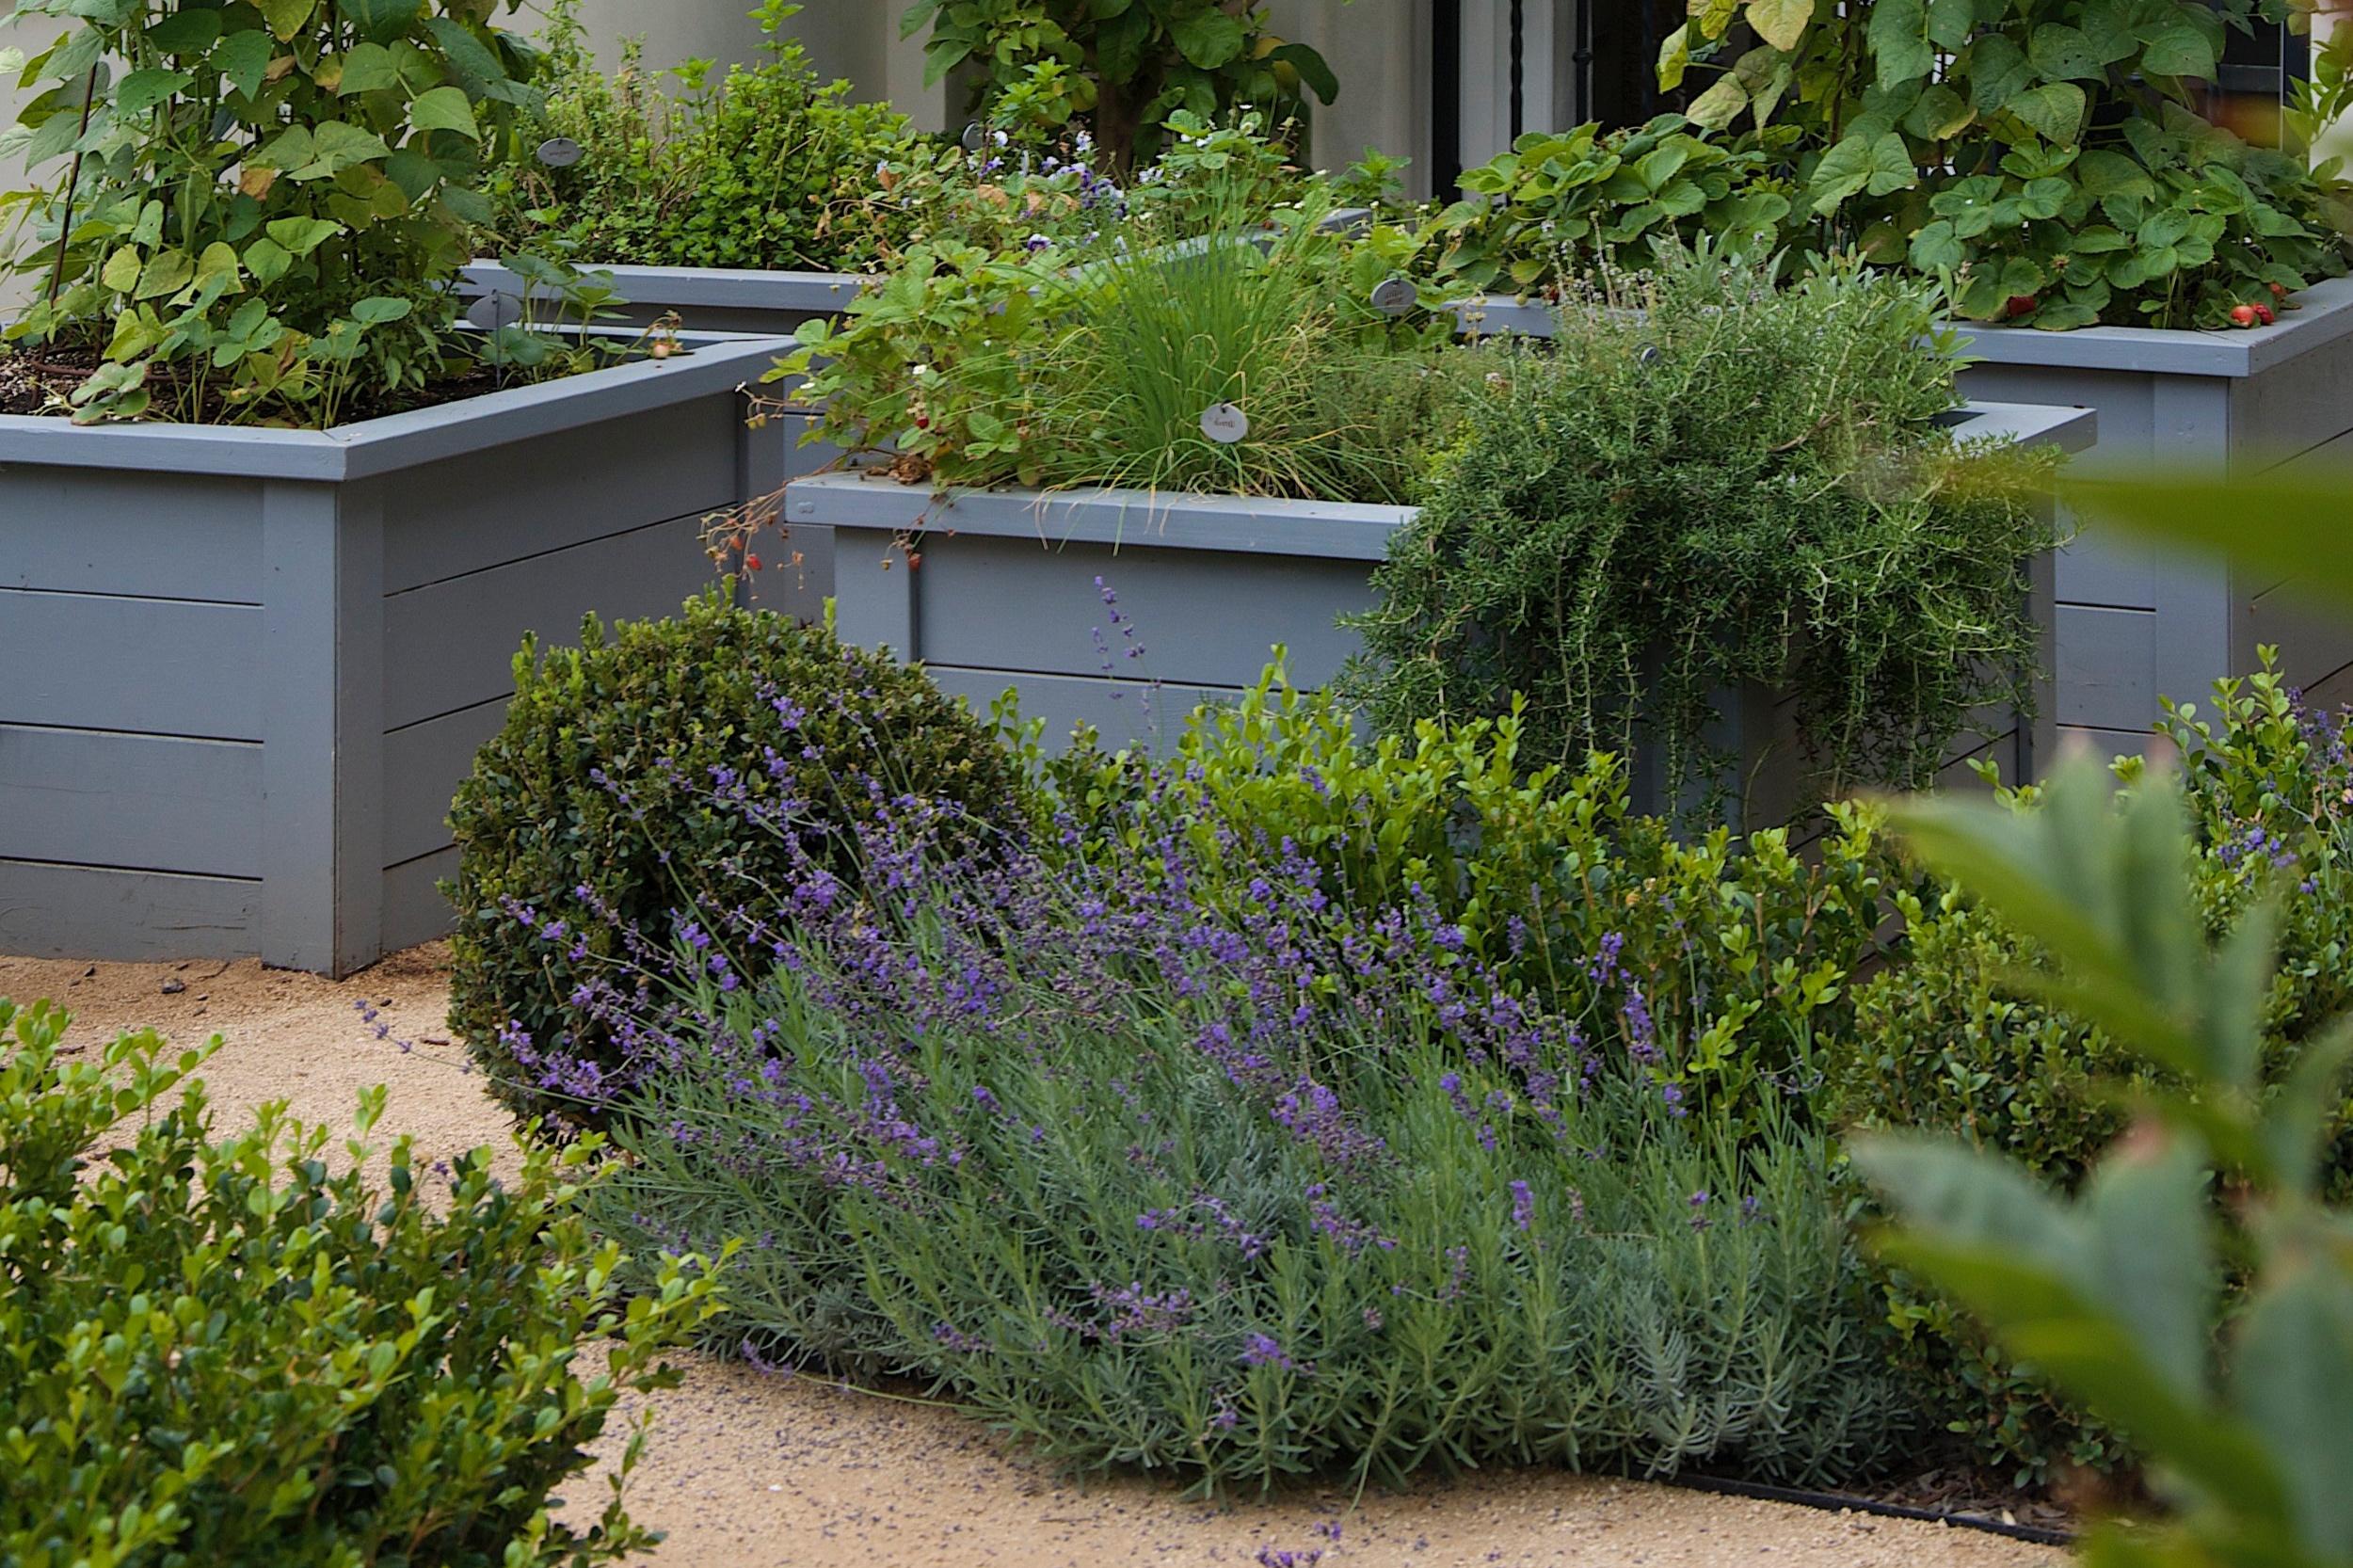 CALIFORNIA LANDSCAPE DESIGN   T he Collaborative Relationship Between Designer and Gardener   April 8, 2019